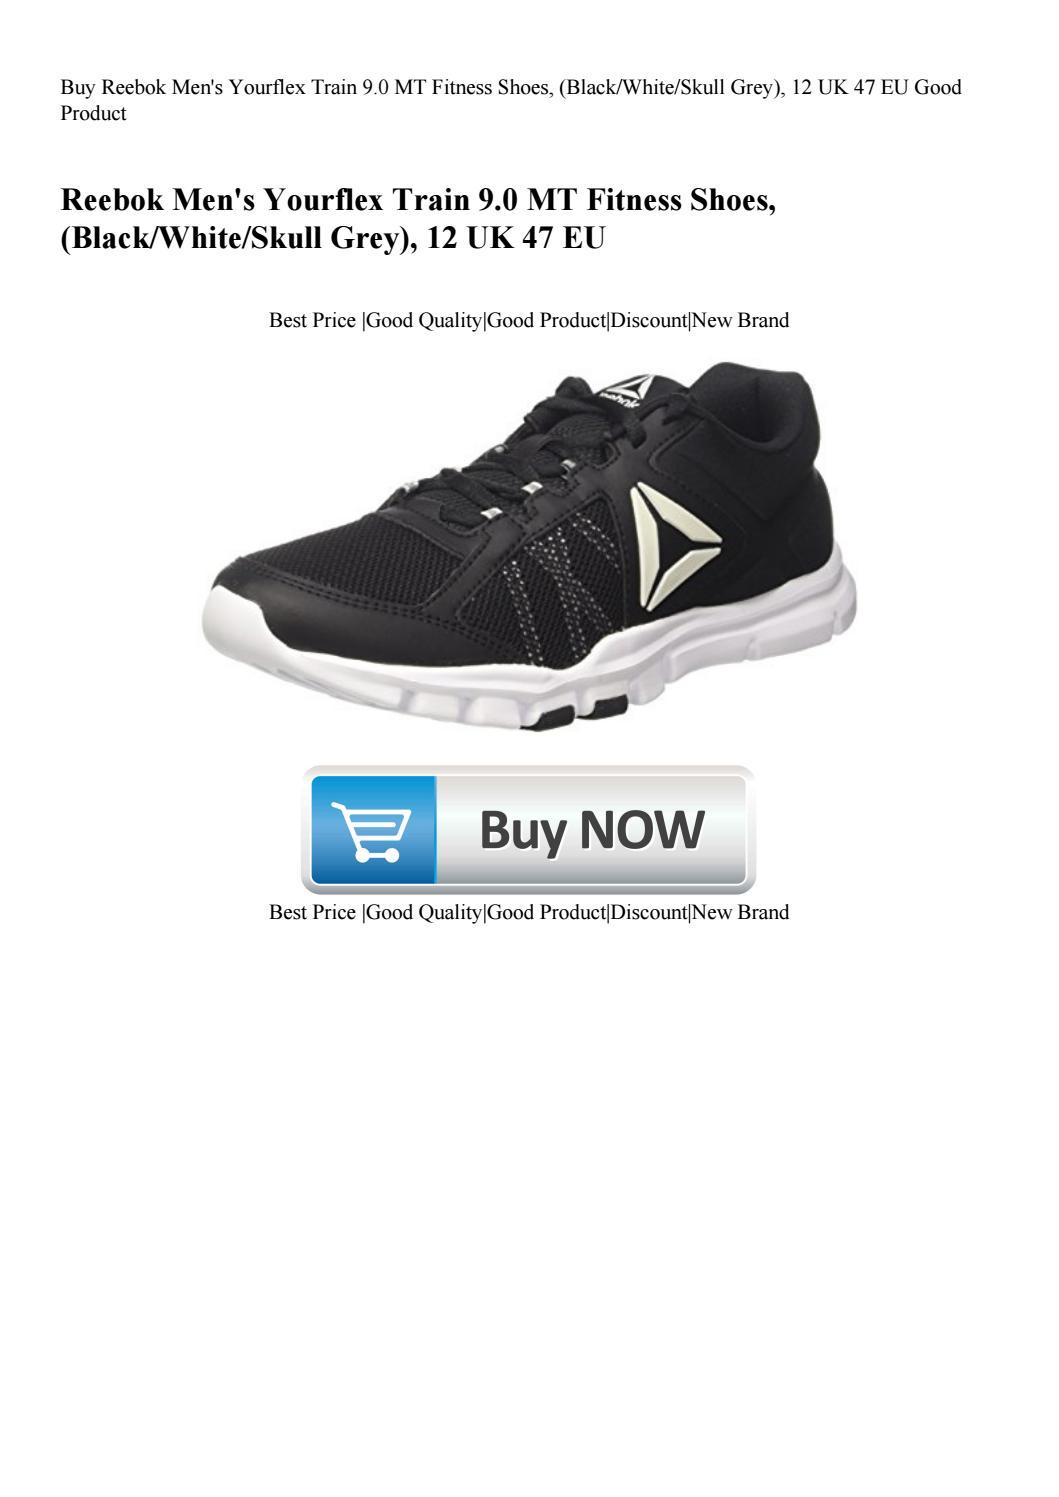 Reebok Yourflex Train 9.0 MT Black//White//Skull Grey Men/'s Shoes